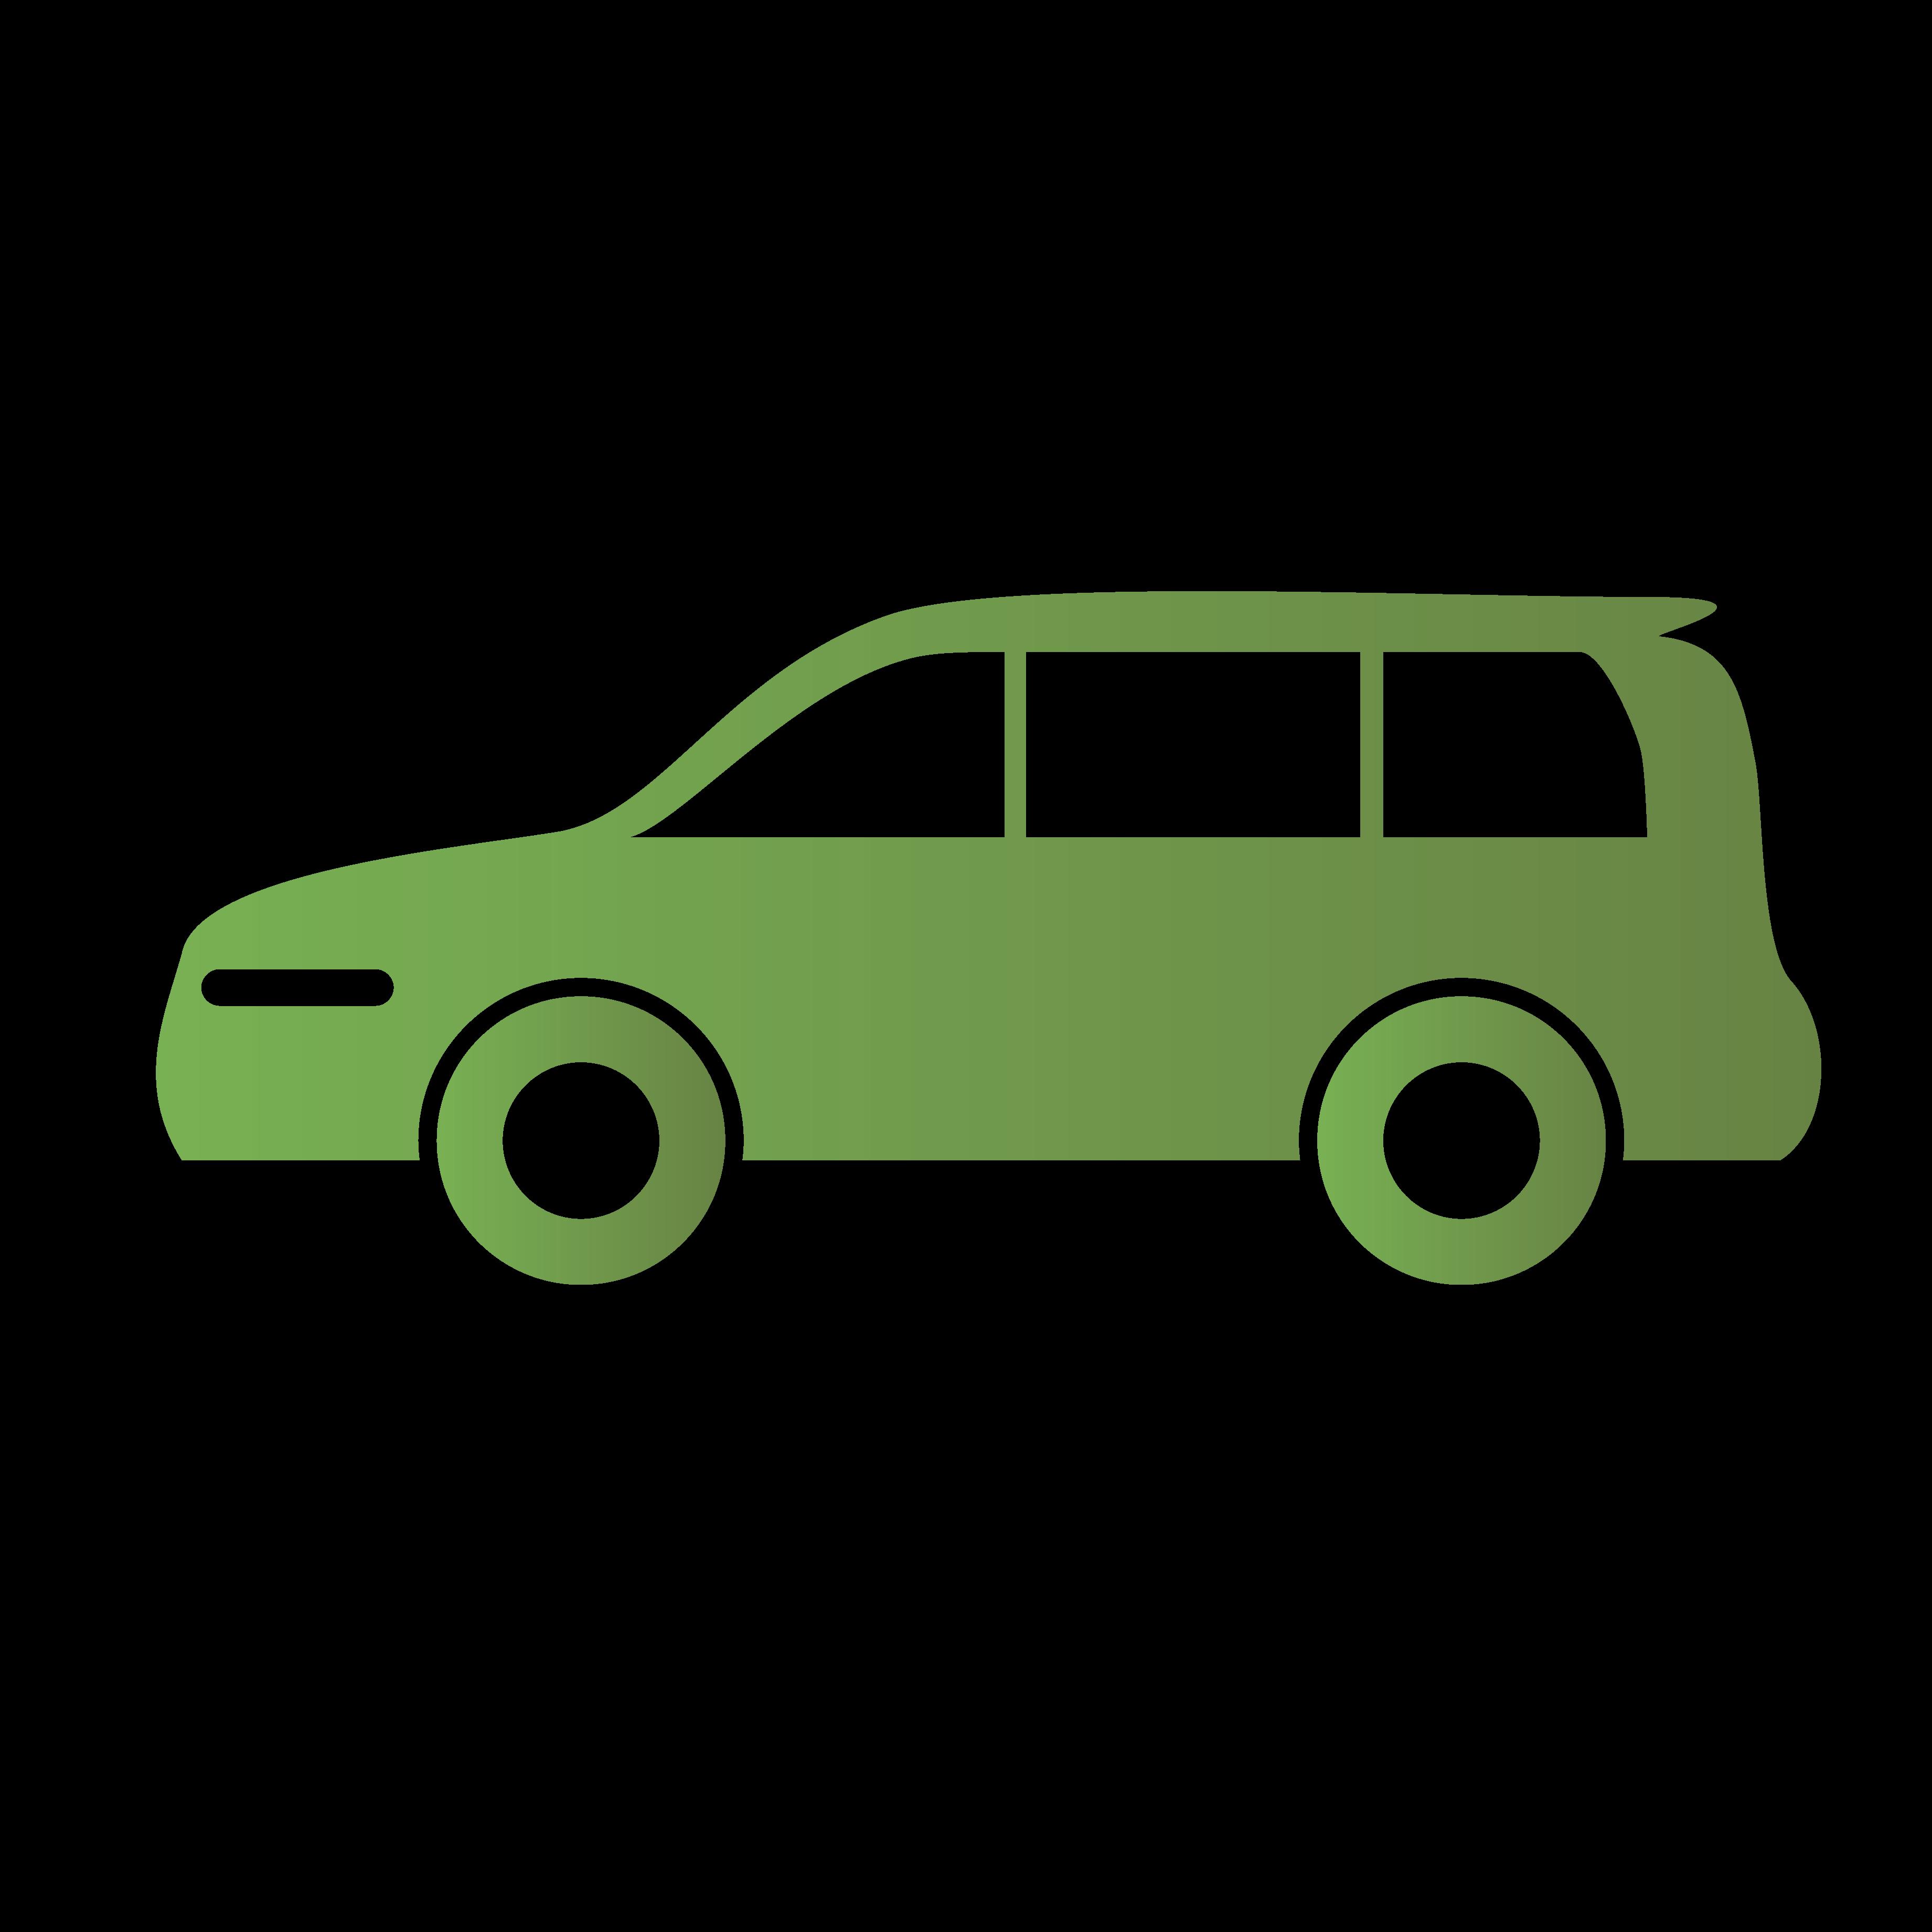 DONATE A Vehicle